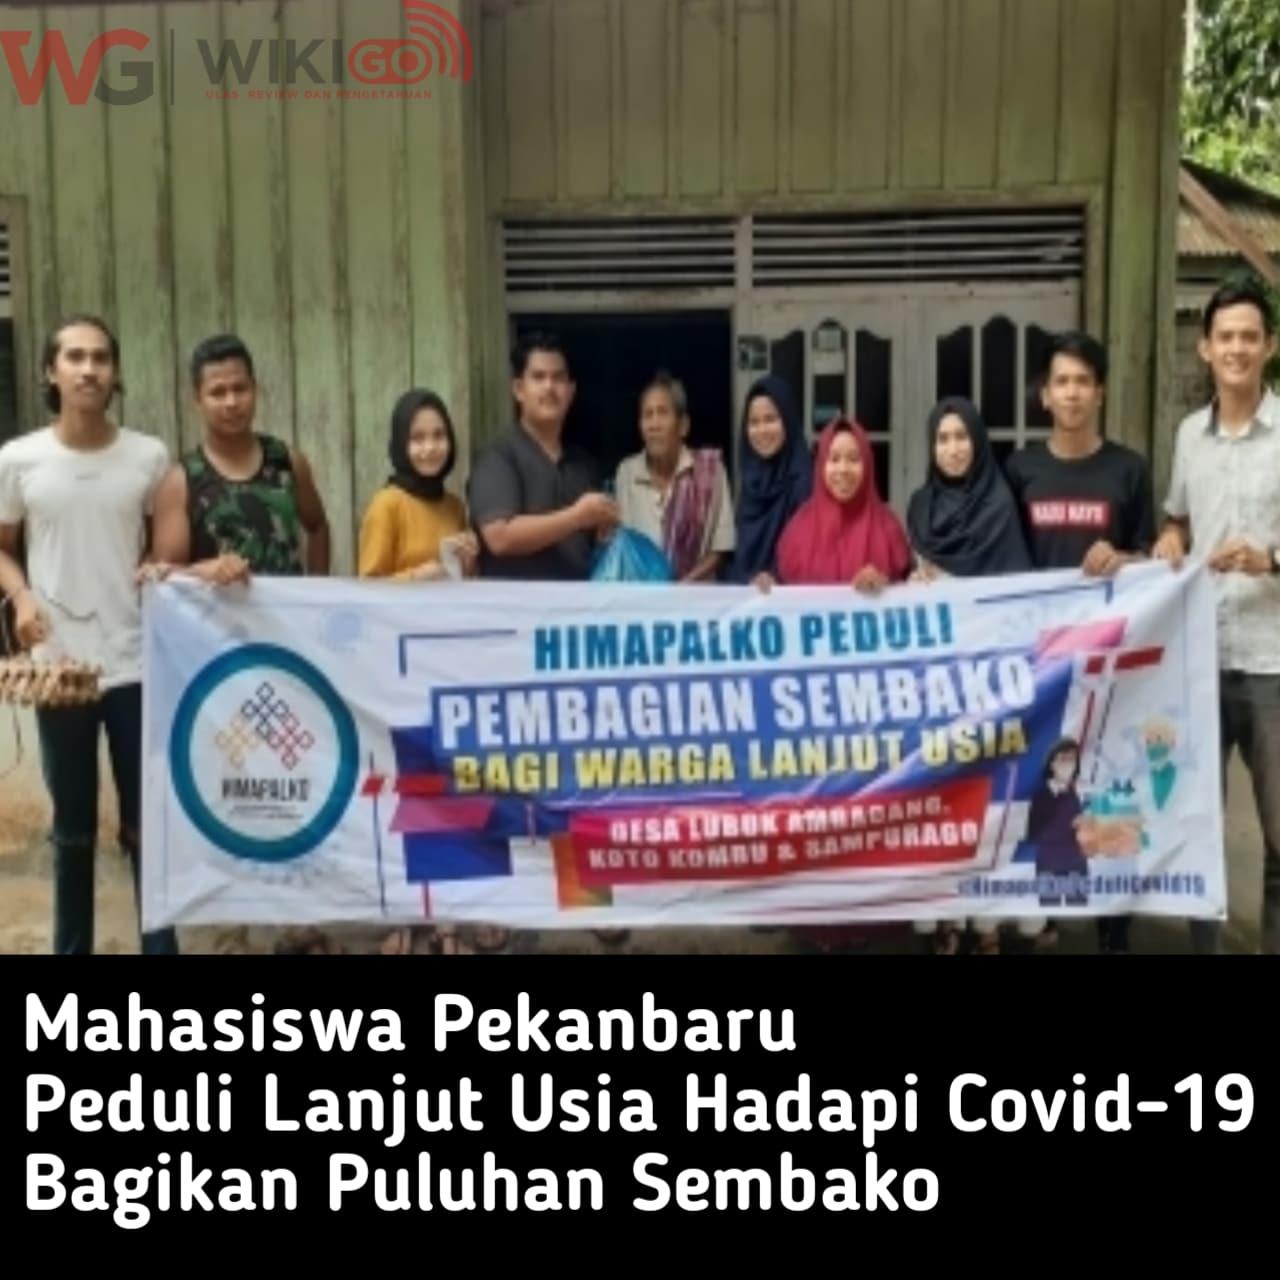 Mahasiswa Pekanbaru peduli Kaum lansia Hadapi Covid-19, Bagikan Sembako